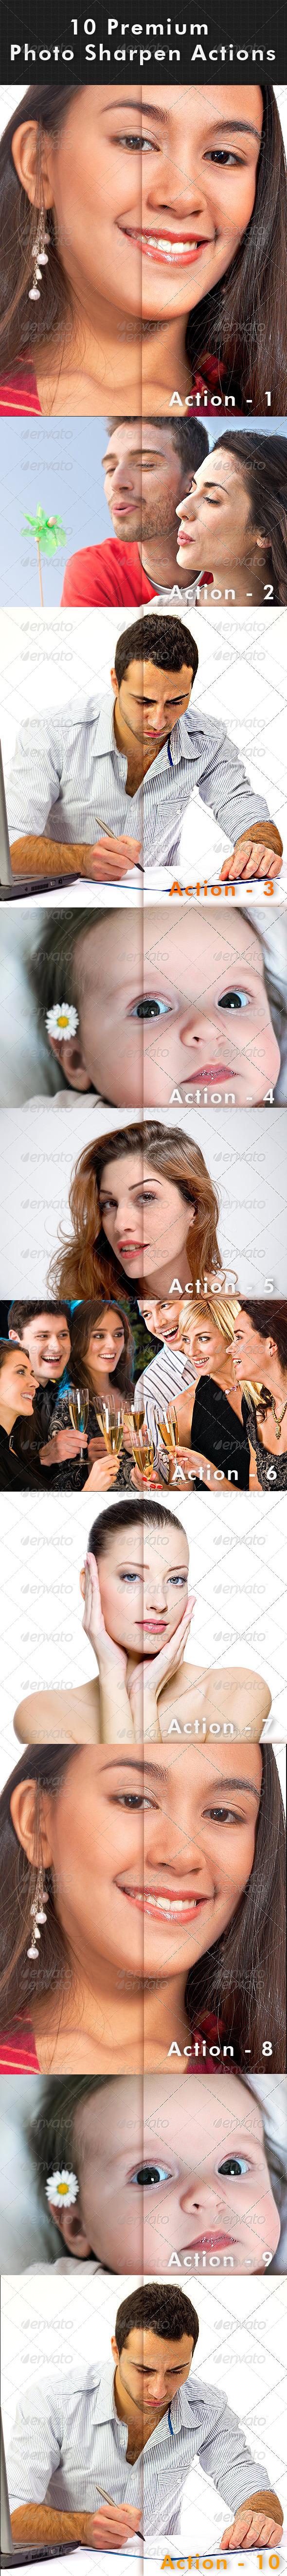 GraphicRiver 10 Premium Photo Sharpen Actions 7214763